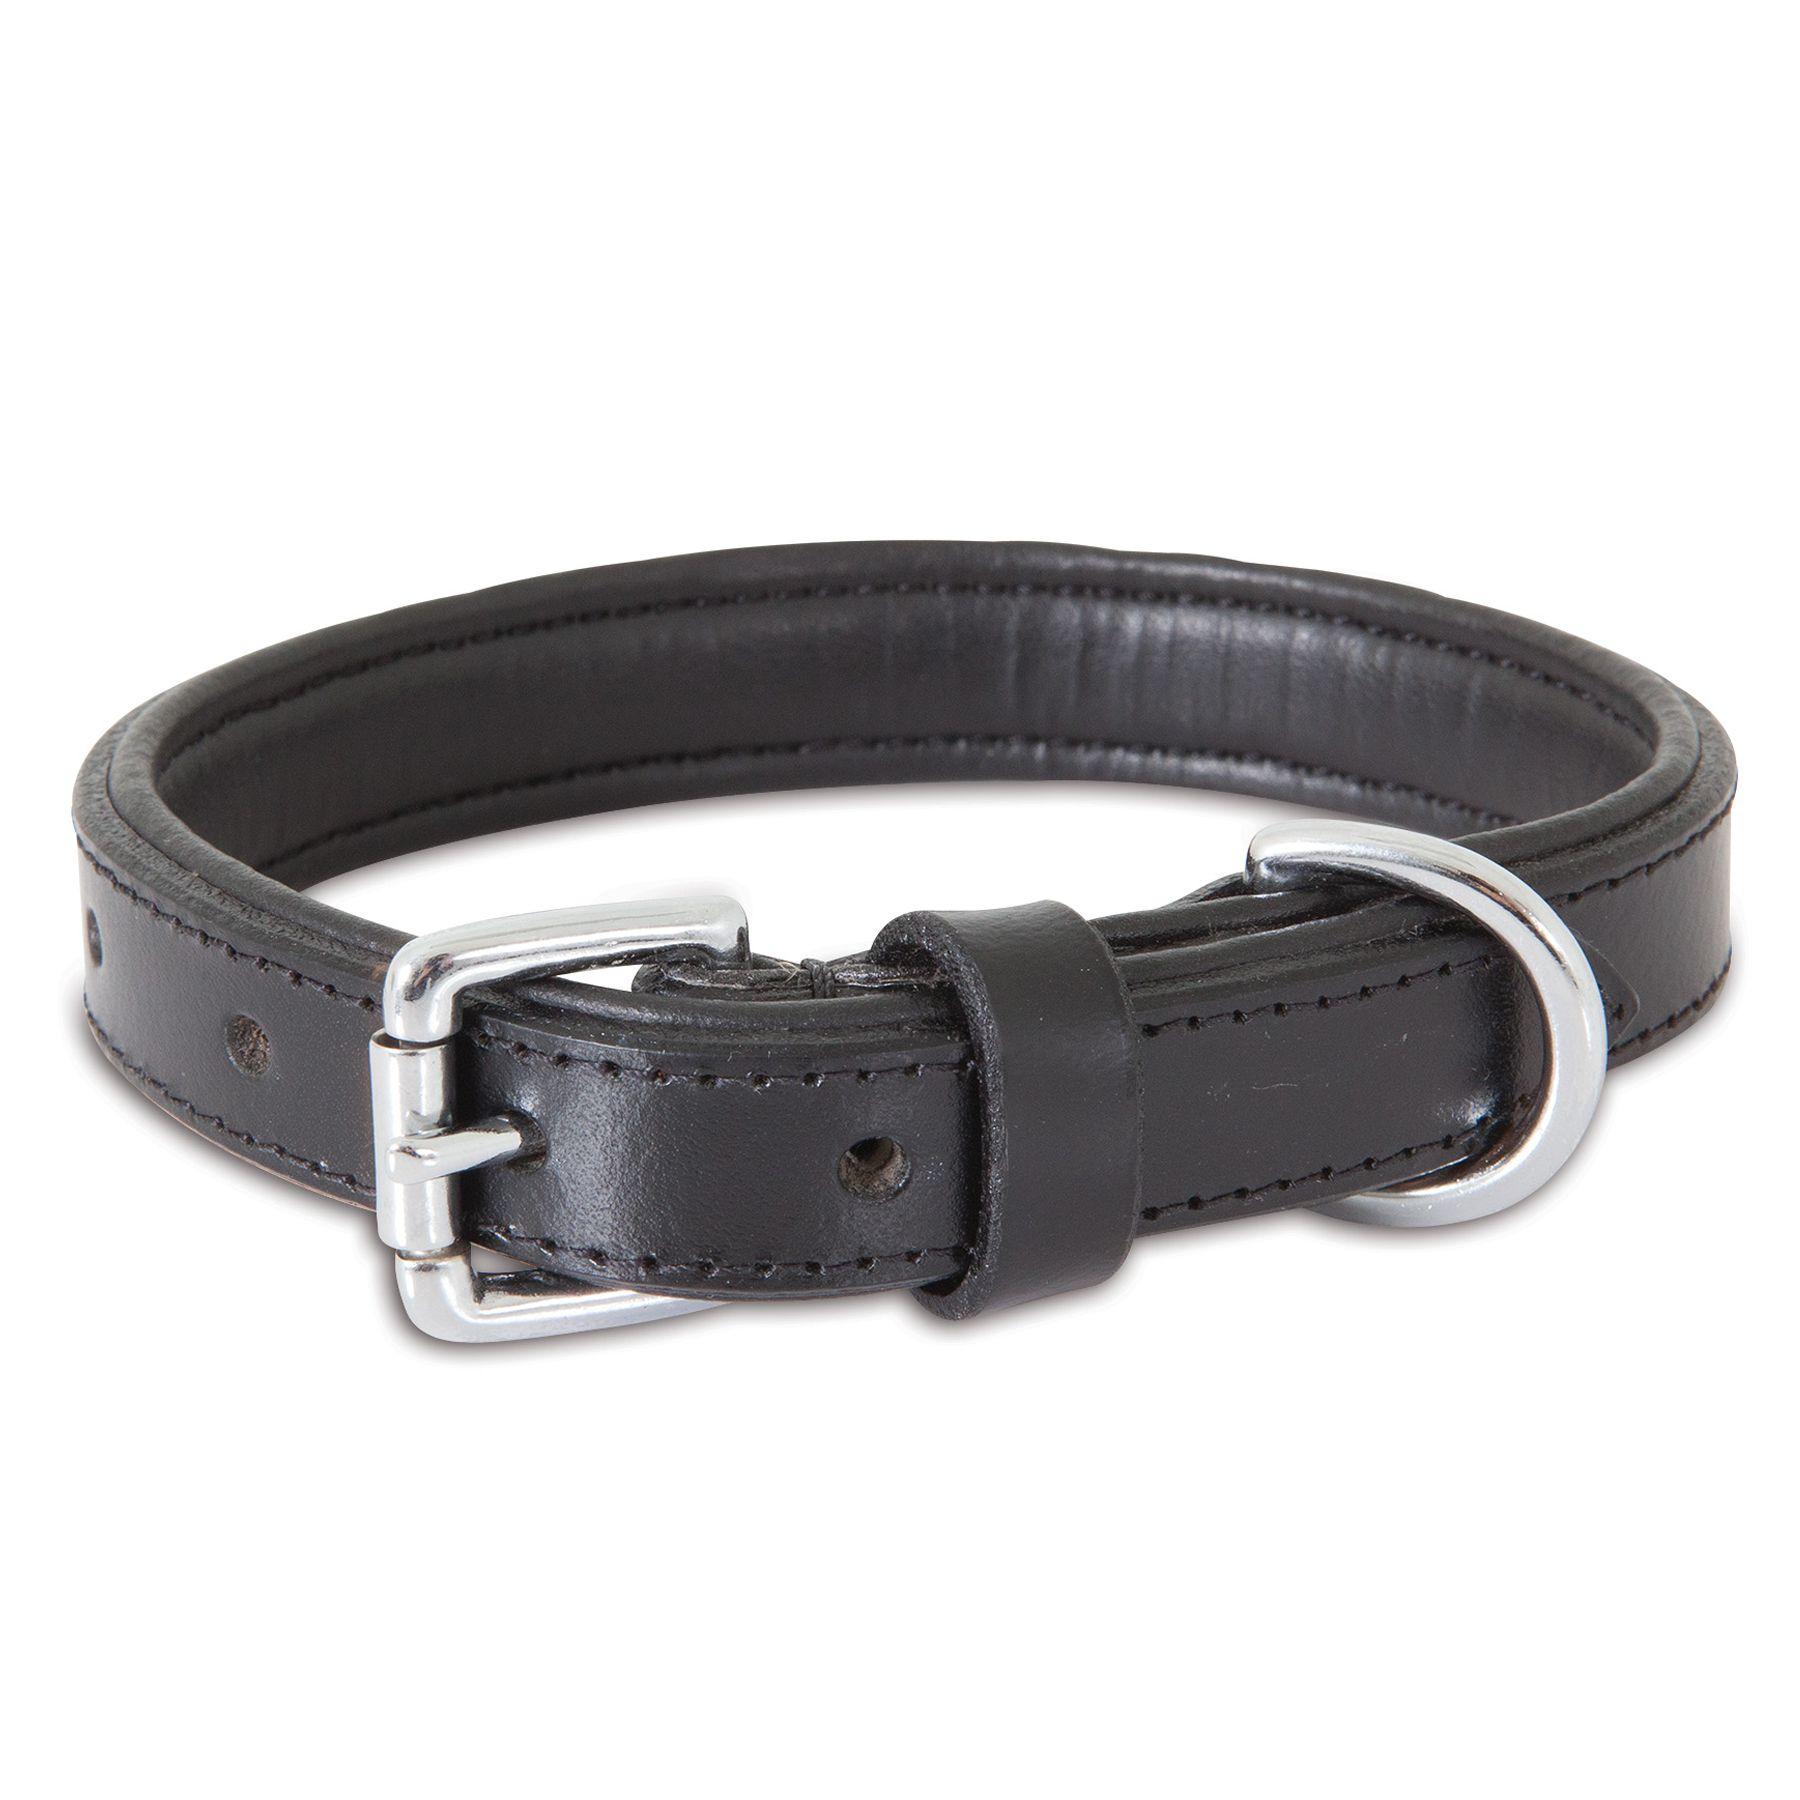 "Petmate® Leather Dog Collar size: 20""L x 1""W, Black 5202132"